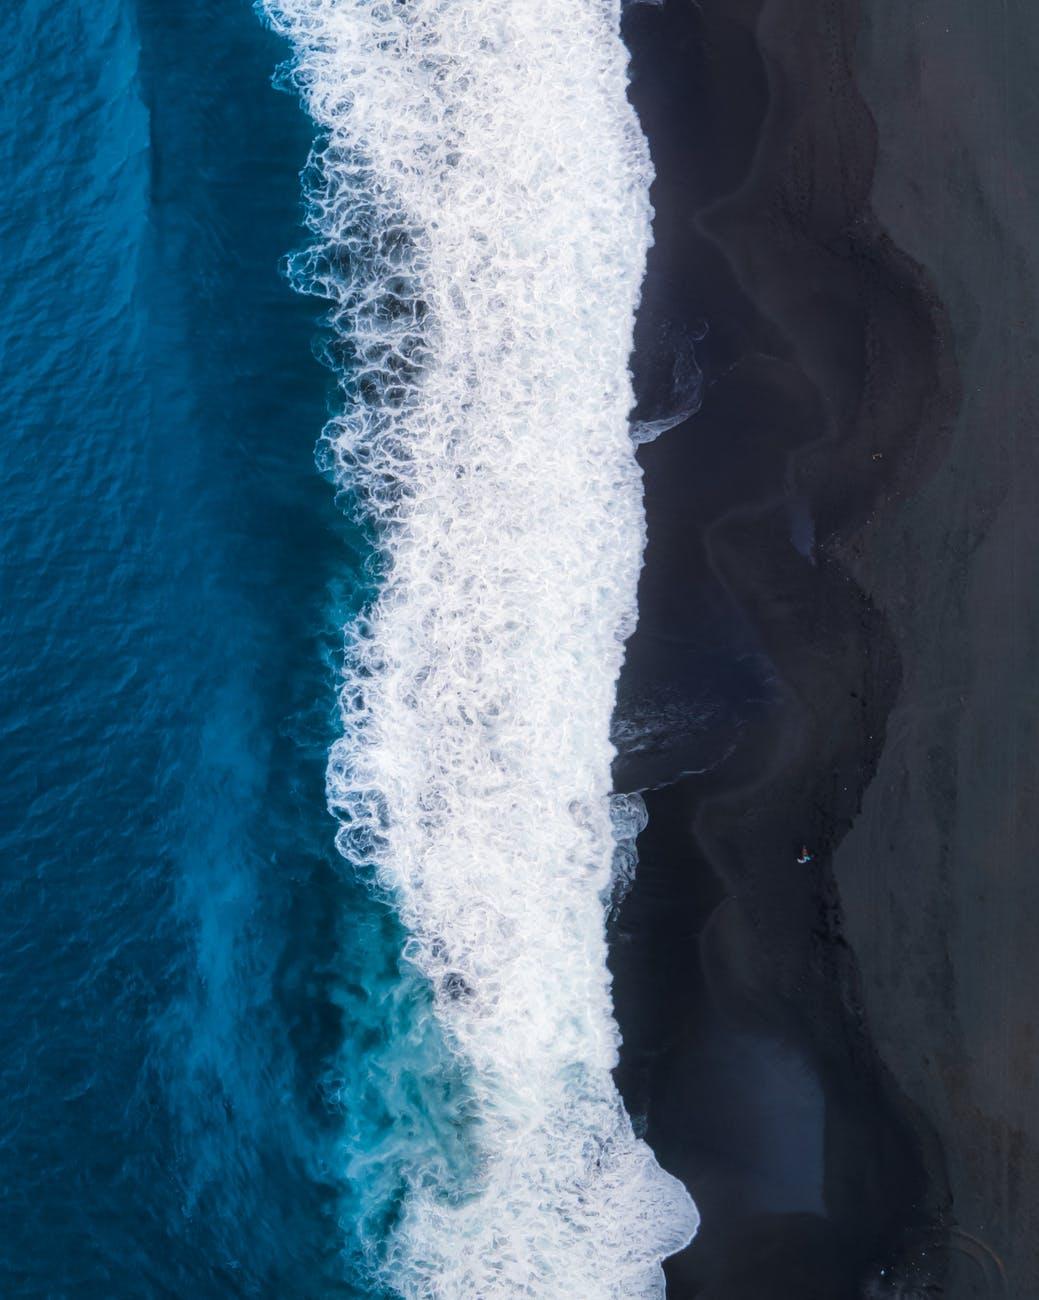 foamy sea splashing on coast